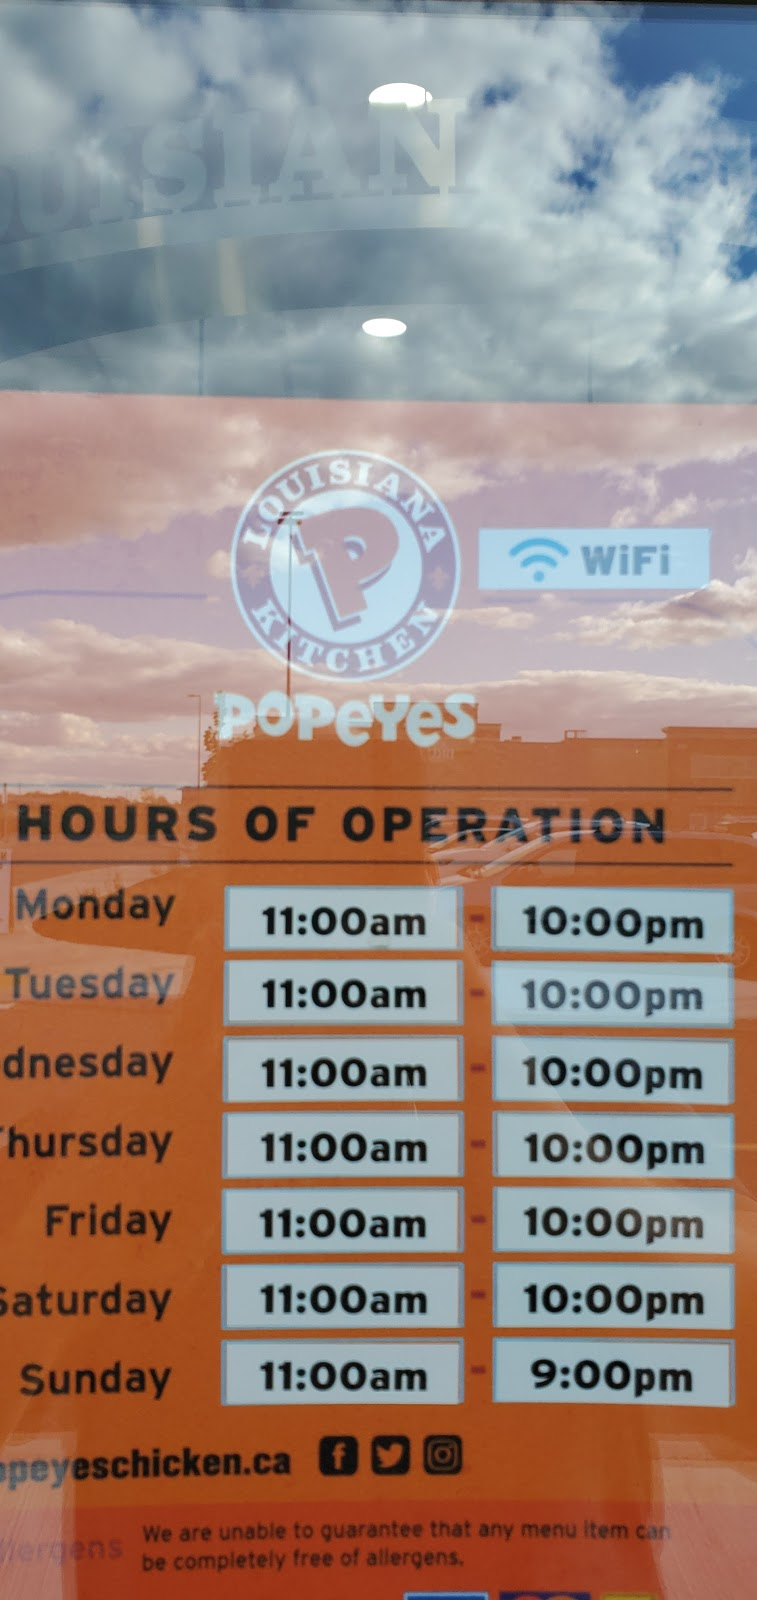 Popeyes Louisiana Kitchen | restaurant | 1352 S Service Rd, Stoney Creek, ON L8E 5C5, Canada | 9056432100 OR +1 905-643-2100